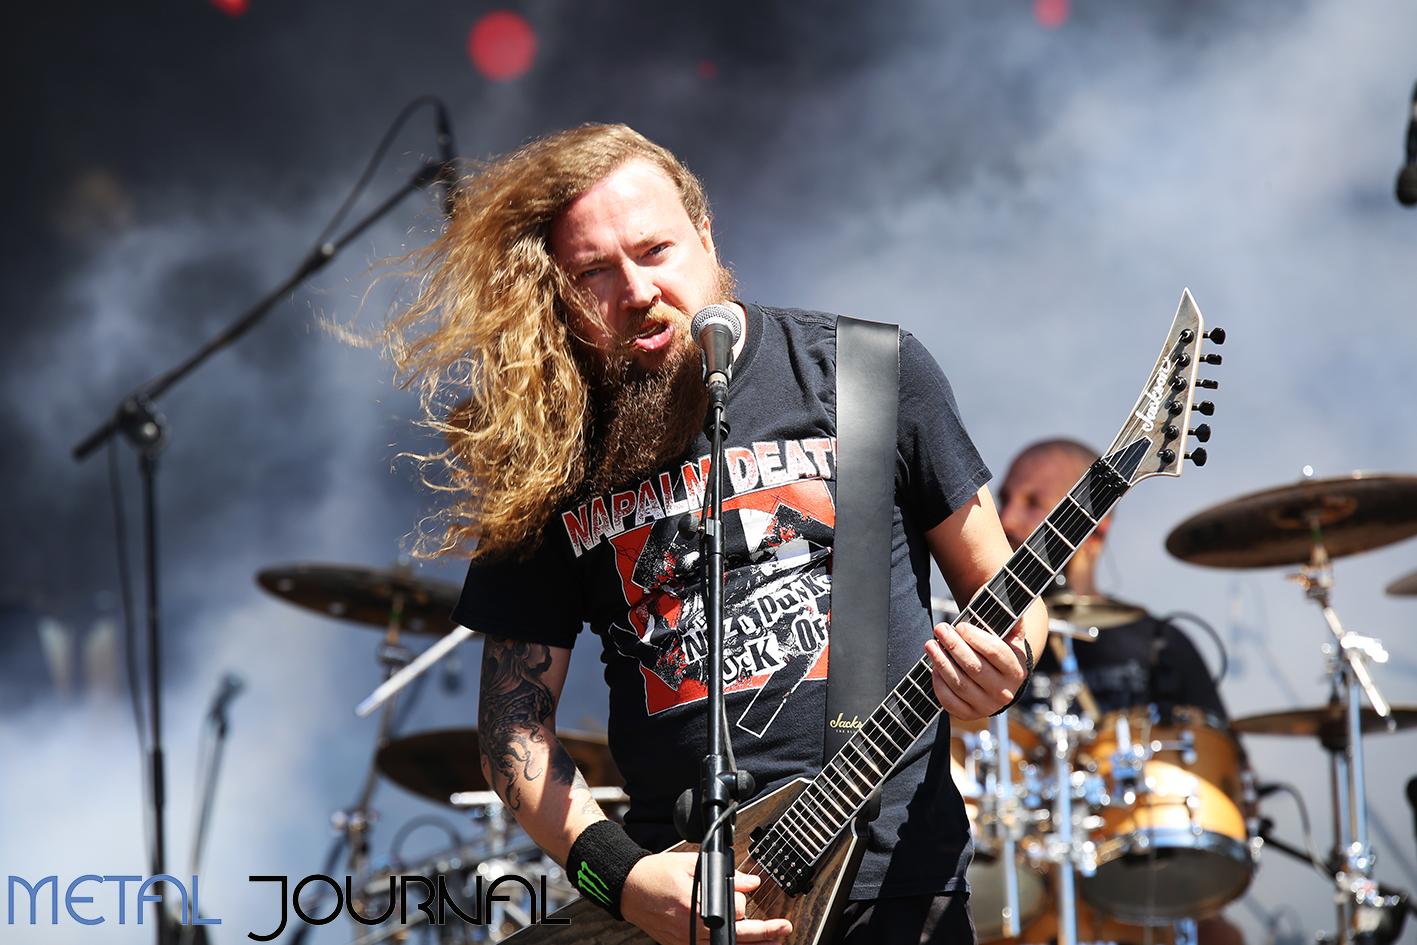 angelus apatrida metal journal rock the coast 2019 pic 1